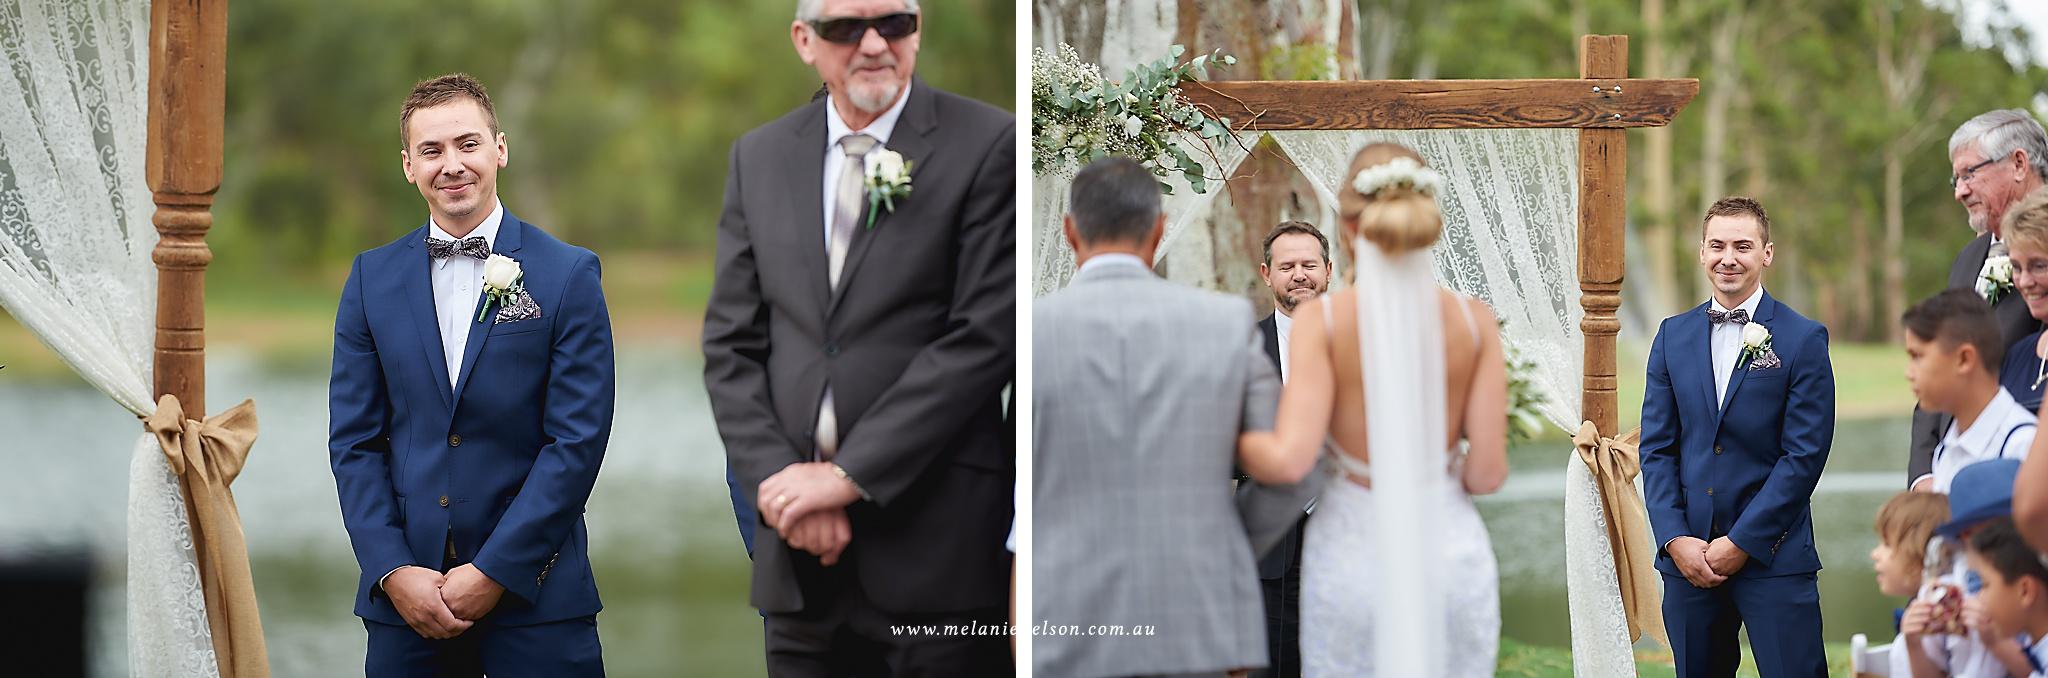 serafino_wedding_photography_0029.jpg